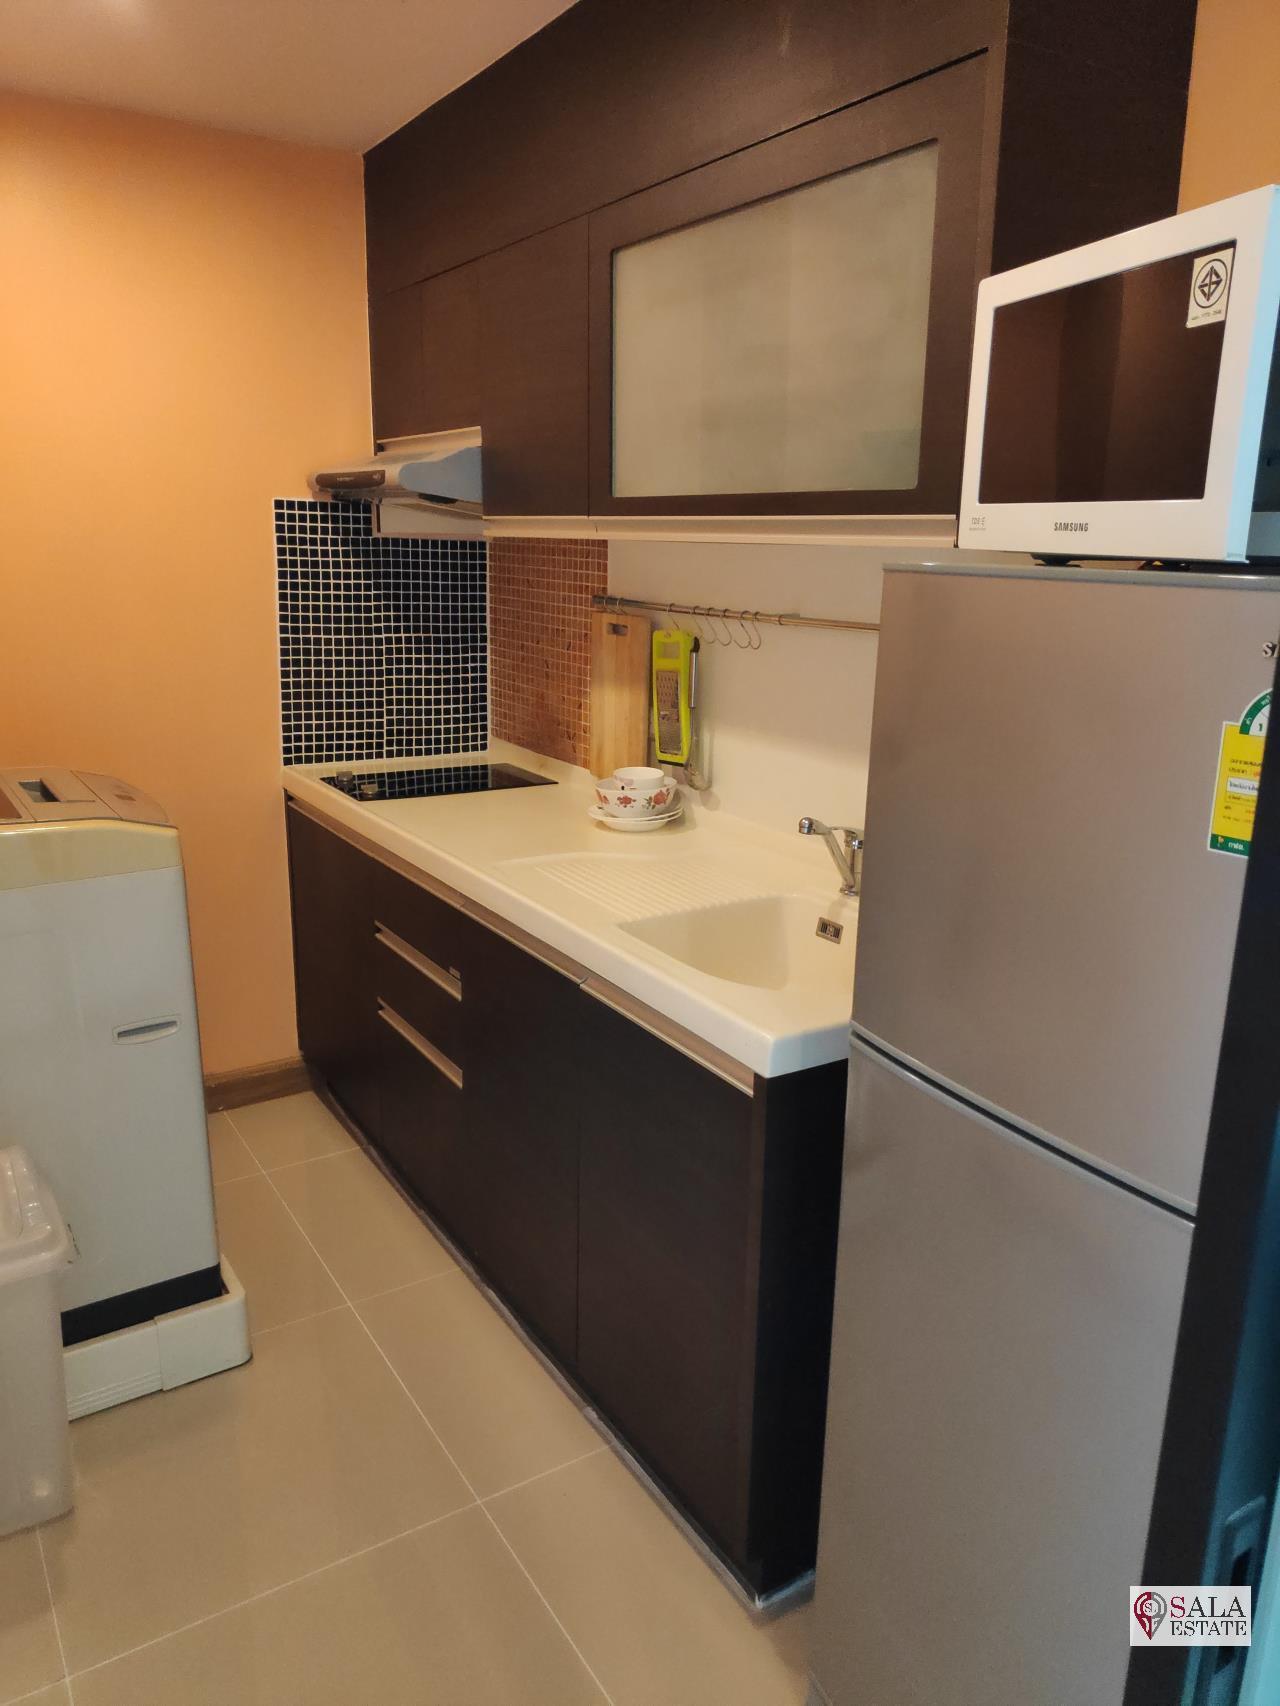 SALA ESTATE Agency's SUPALAI PREMIER NARATHIWAS – BTS CHONG NONSI, 1 BEDROOM 1 BATHROOM, FULLY FERNISHED, CITY VIEW 19